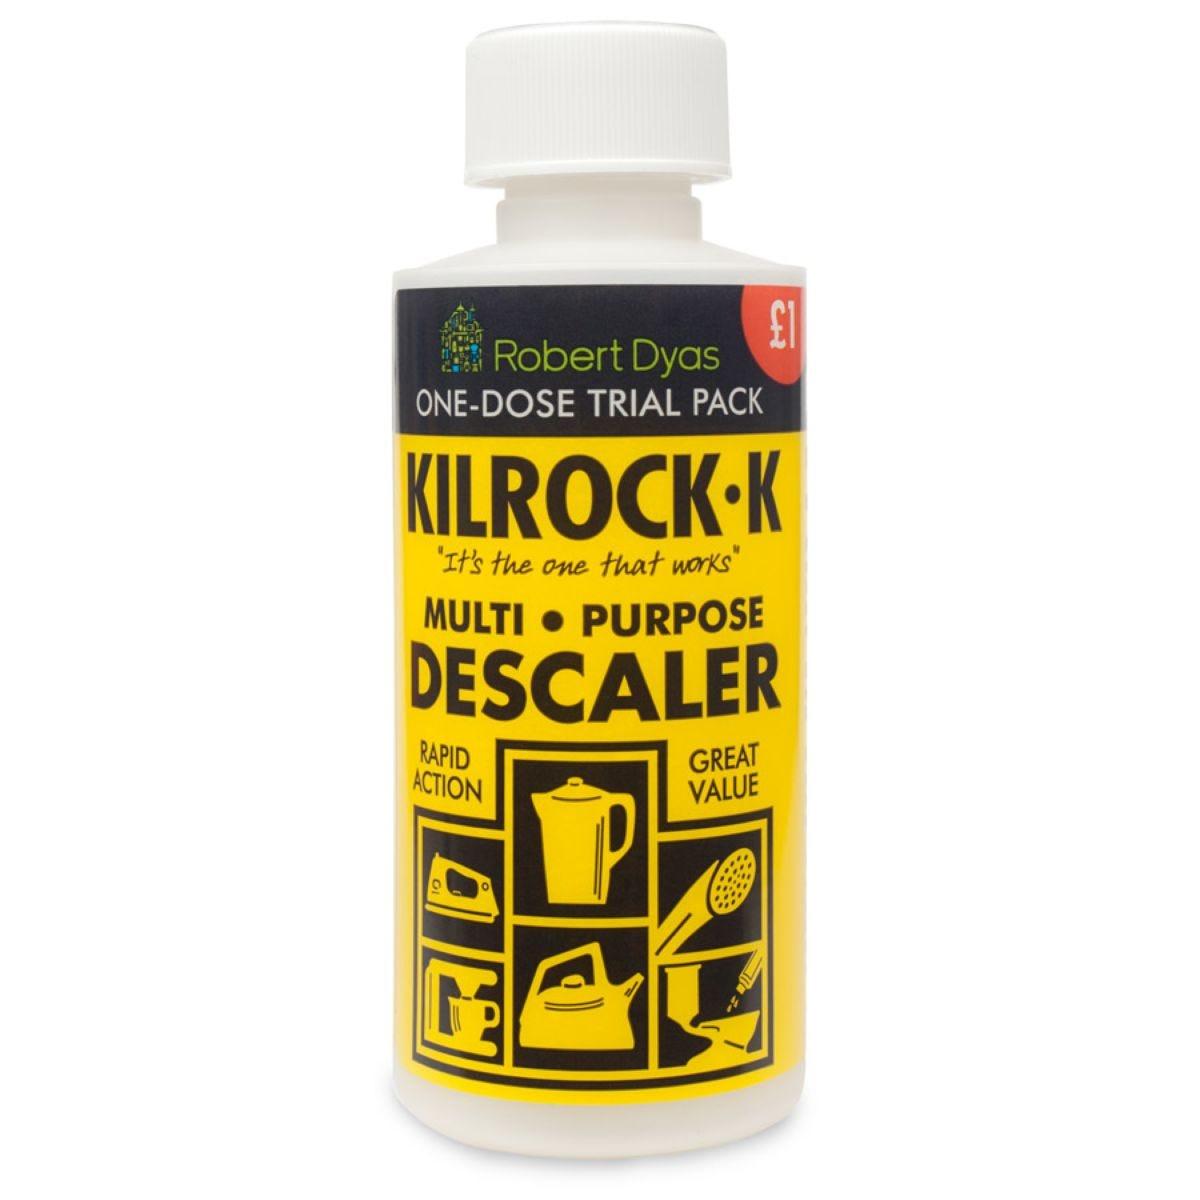 Kilrock K Descaler - 135ml